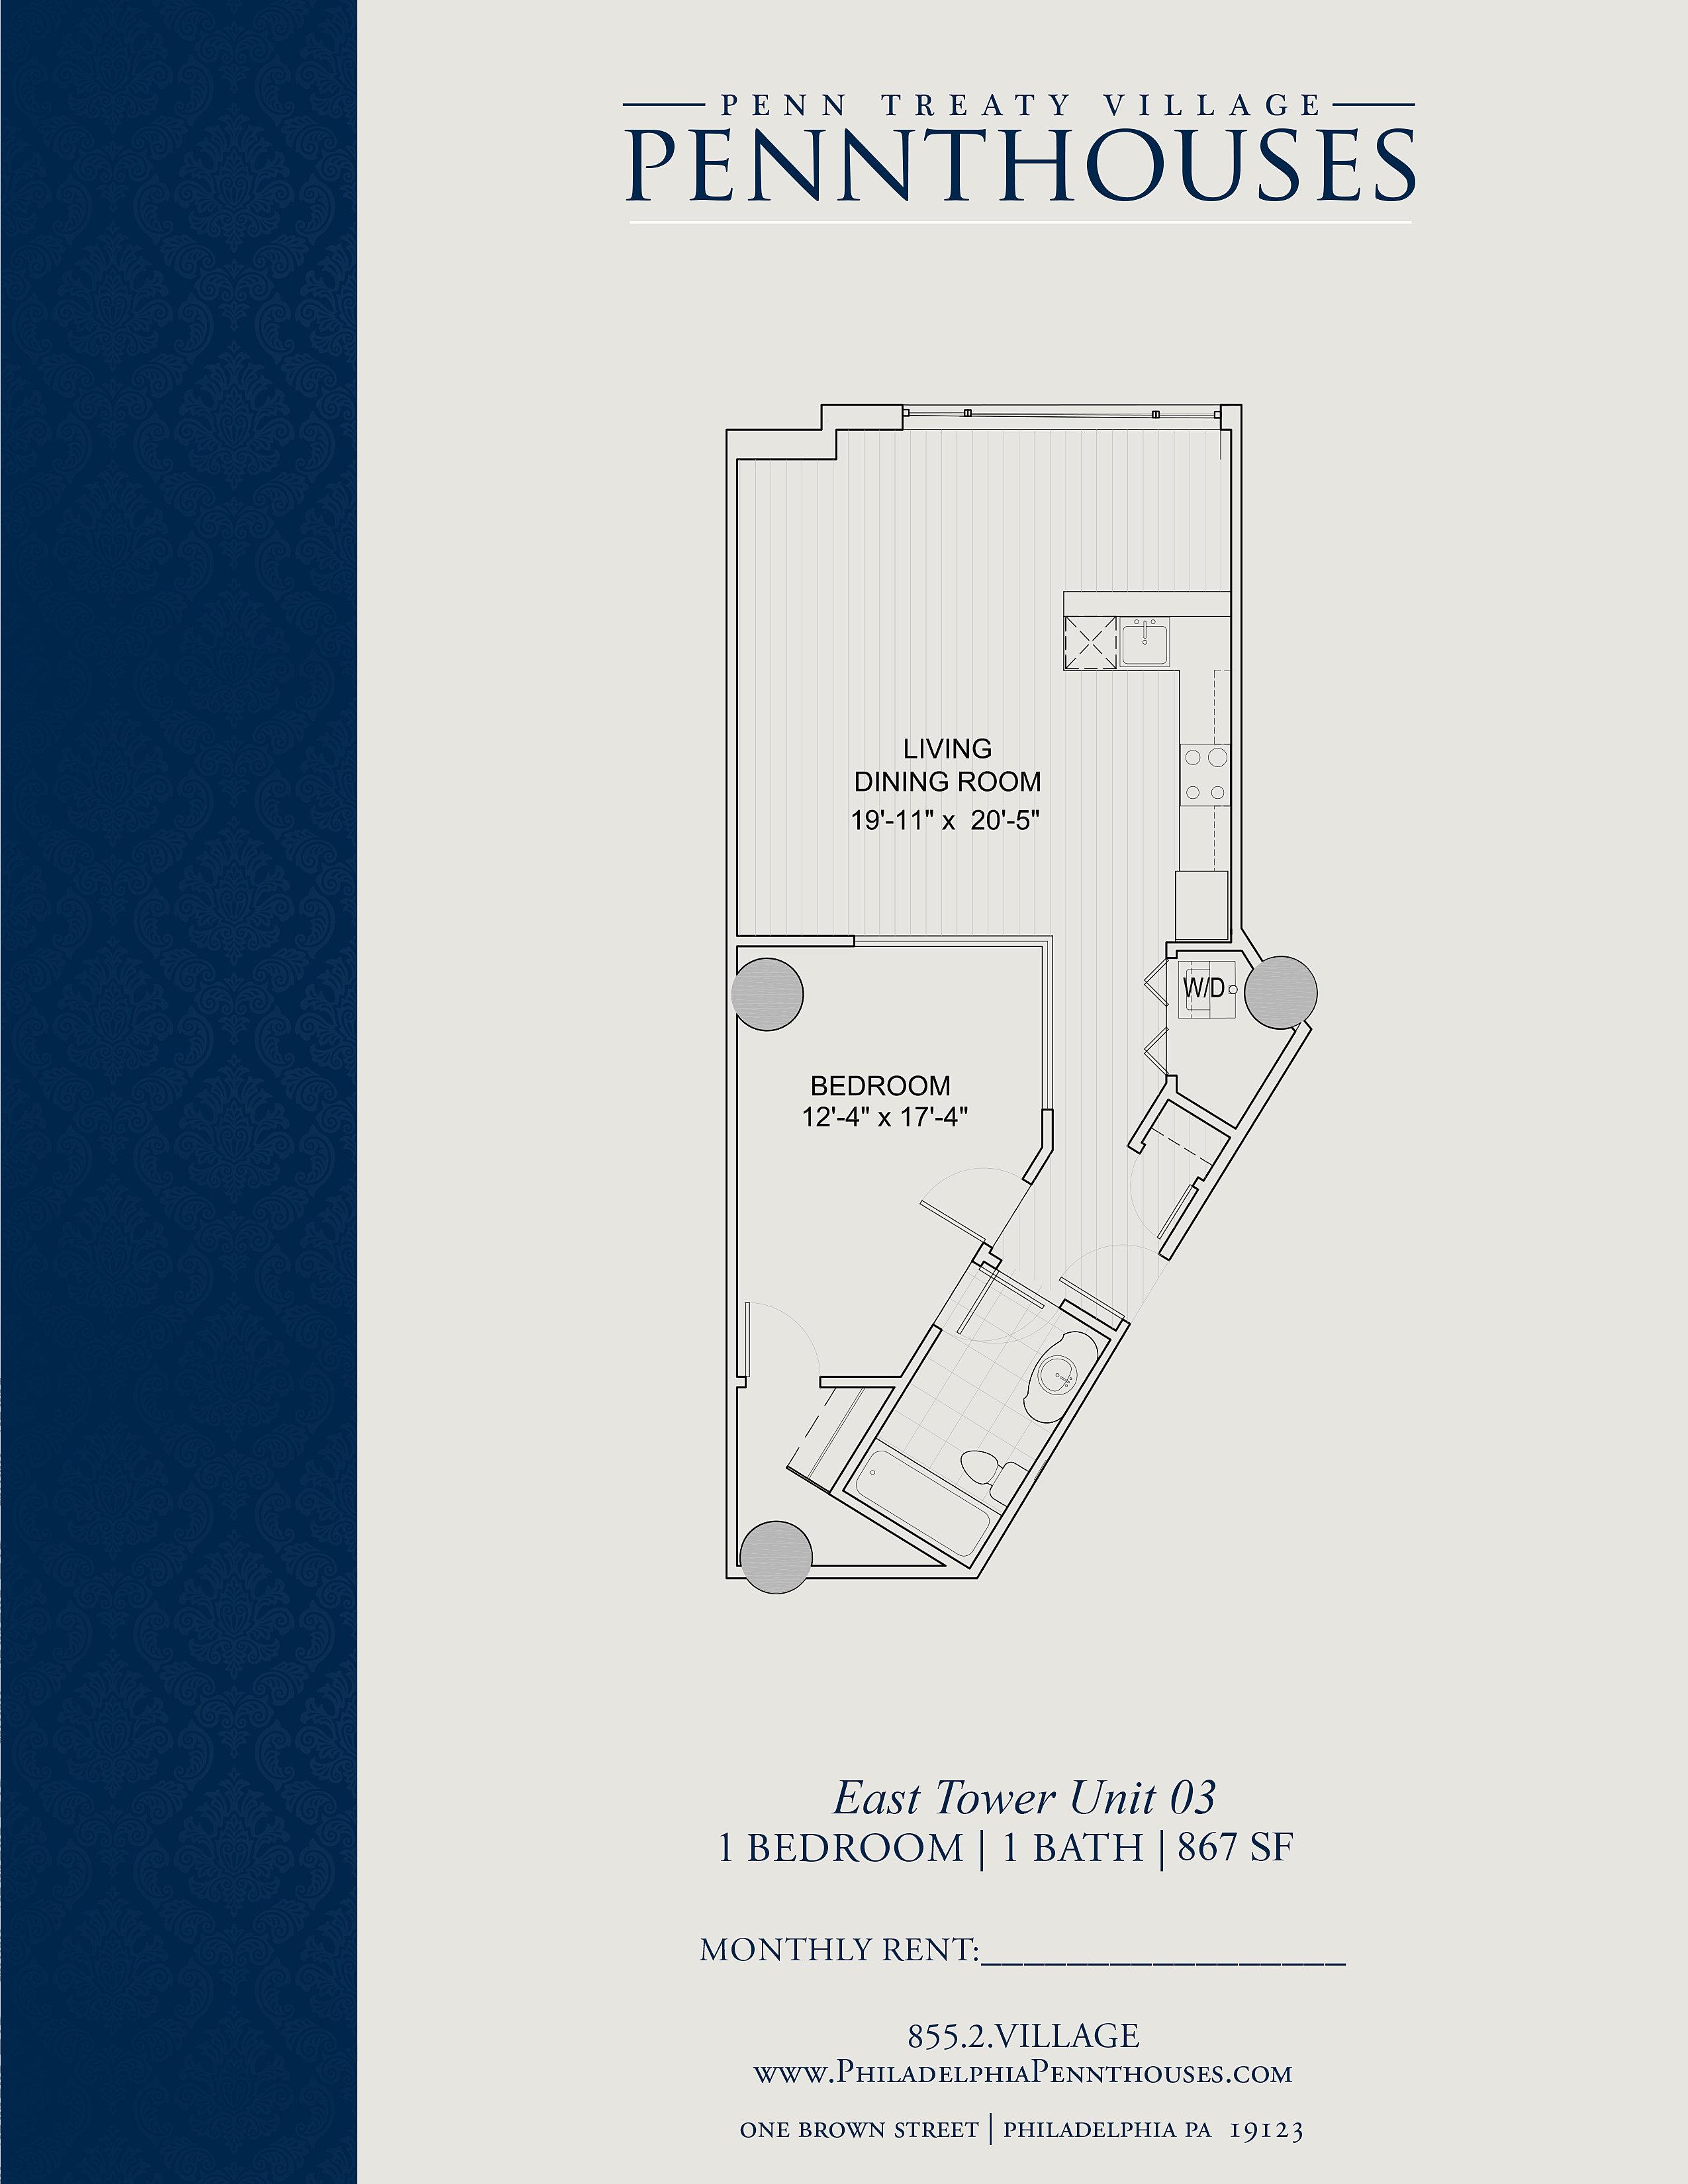 Penn Treaty Village Pennthouses Luxury Apartments In Philadelphia East Tower Unit 03